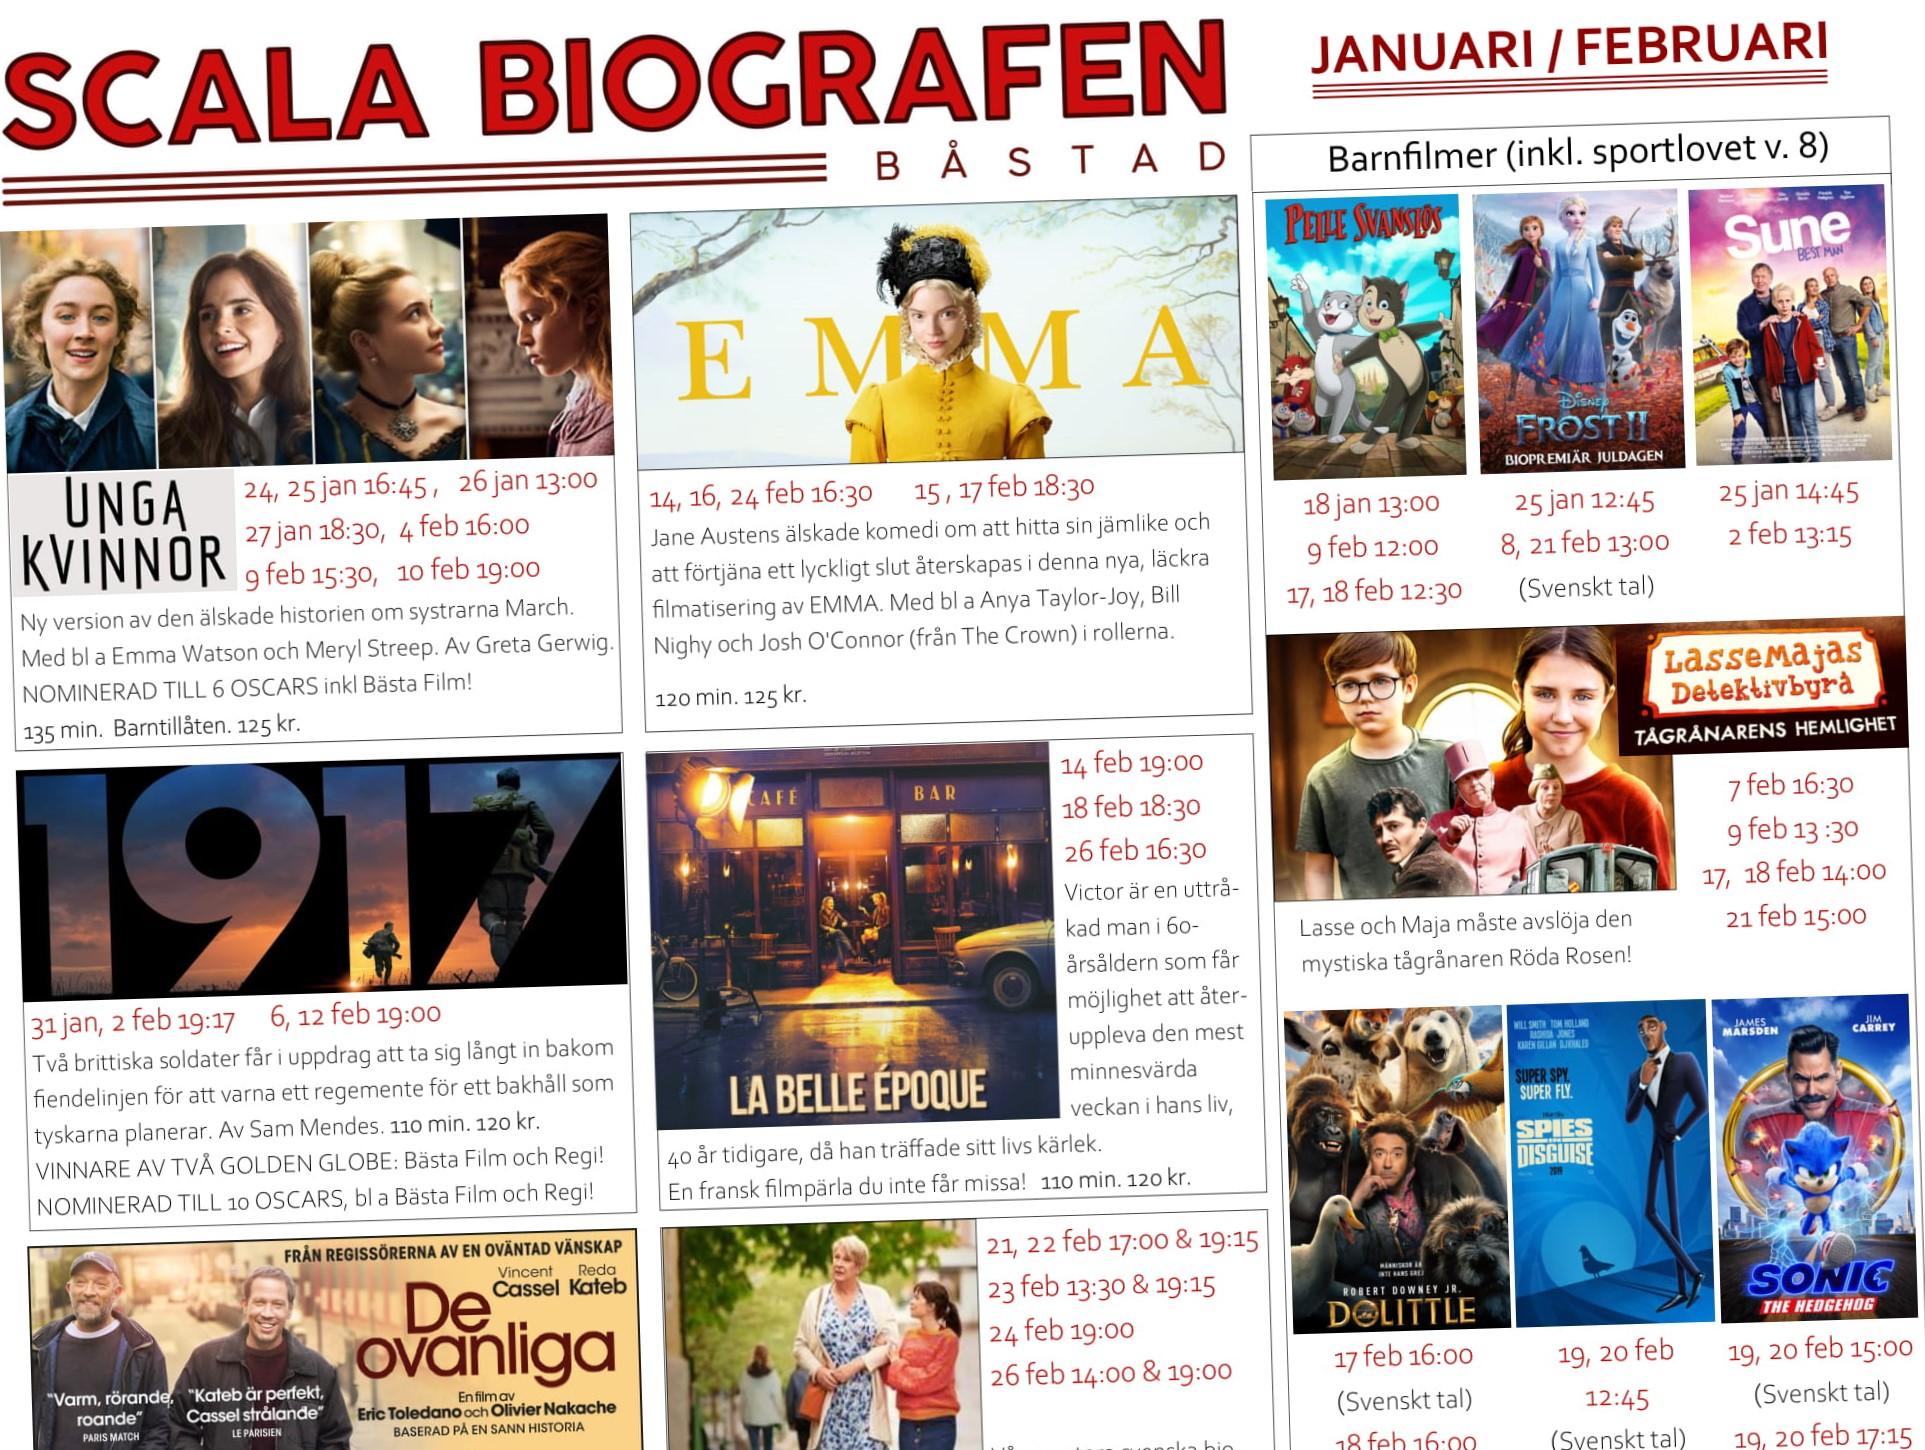 Programmet för Scala Biografen, Januari/Februari